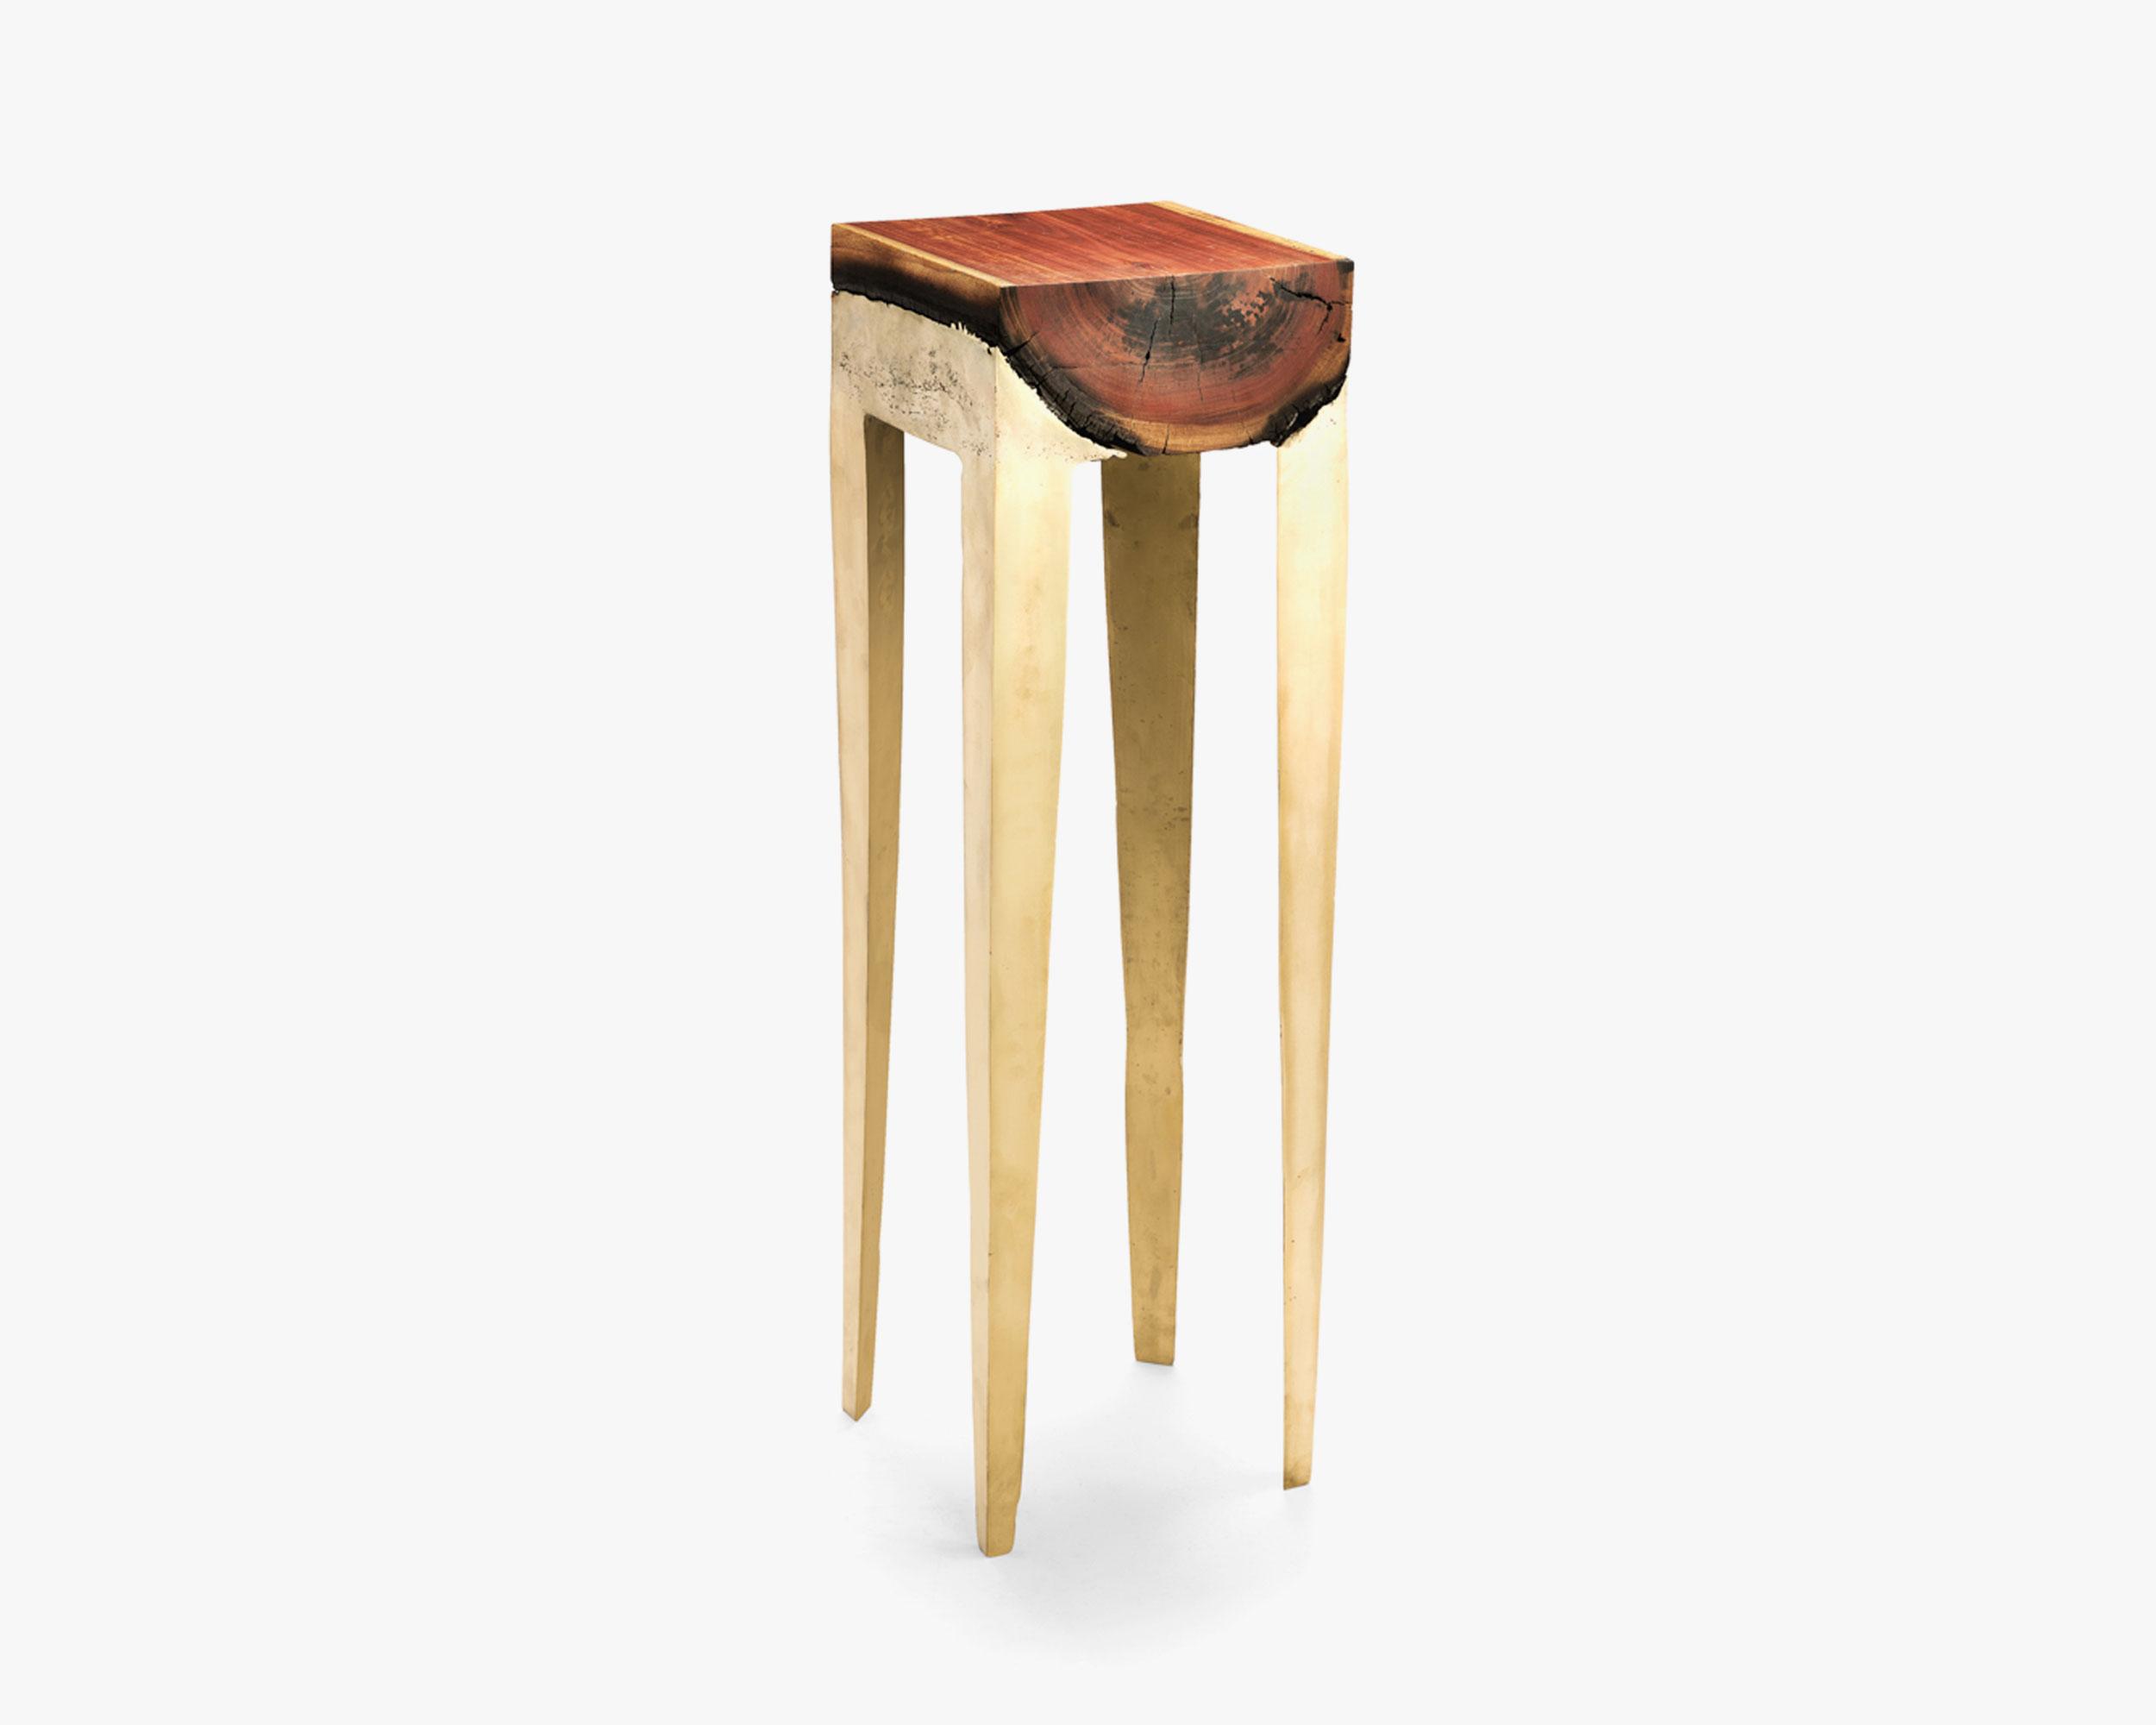 Hilla-Shamia-Wood-Casting-017-gris